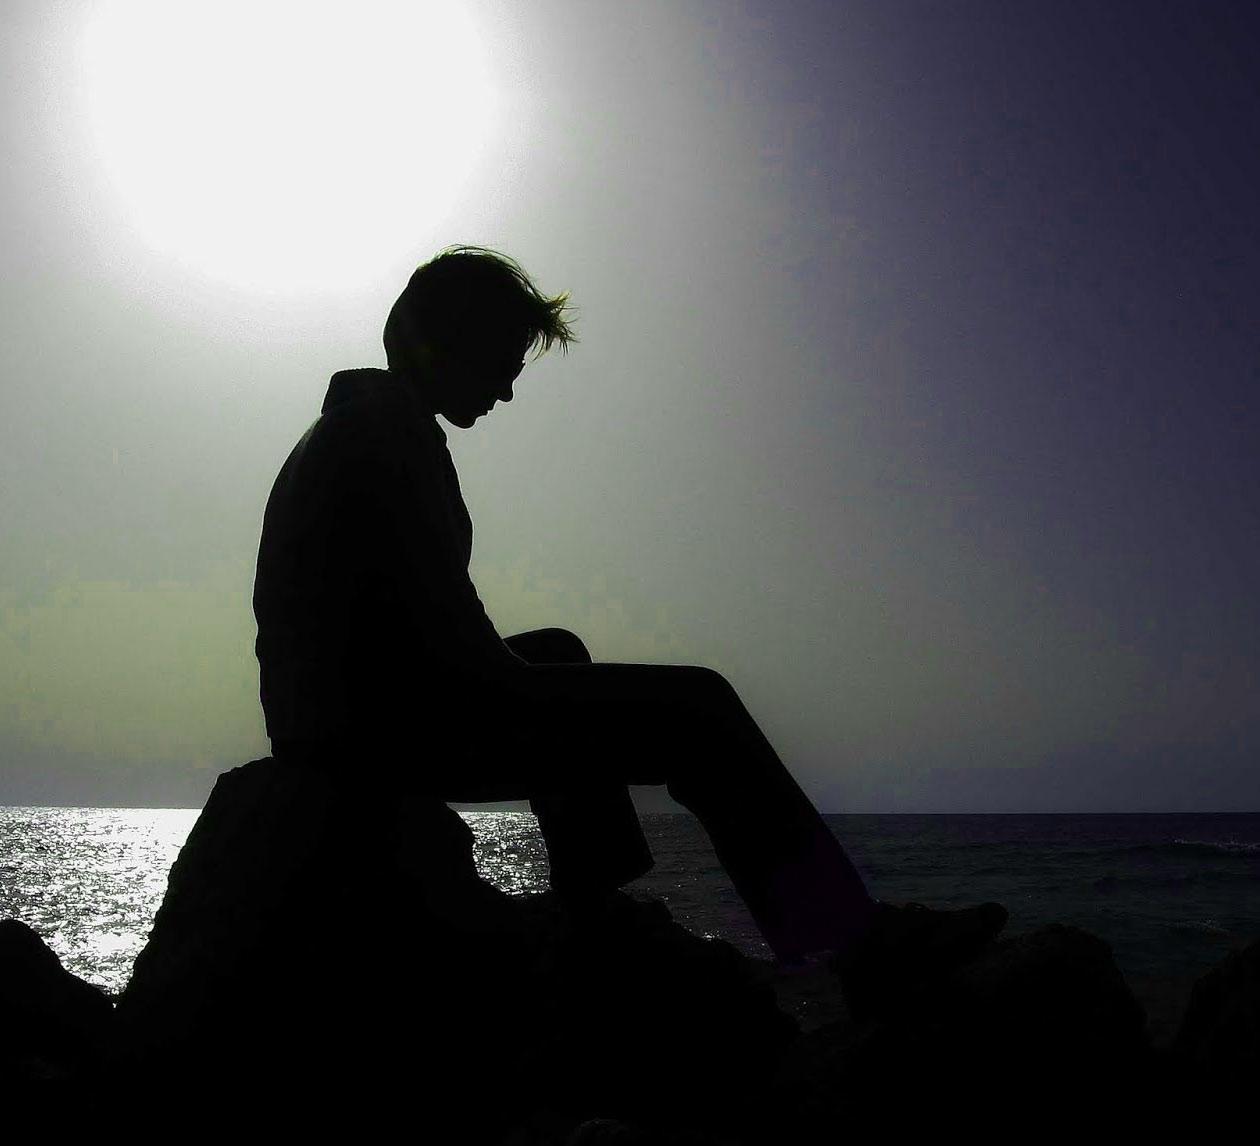 Alone Boys Whatsapp DP Images 2